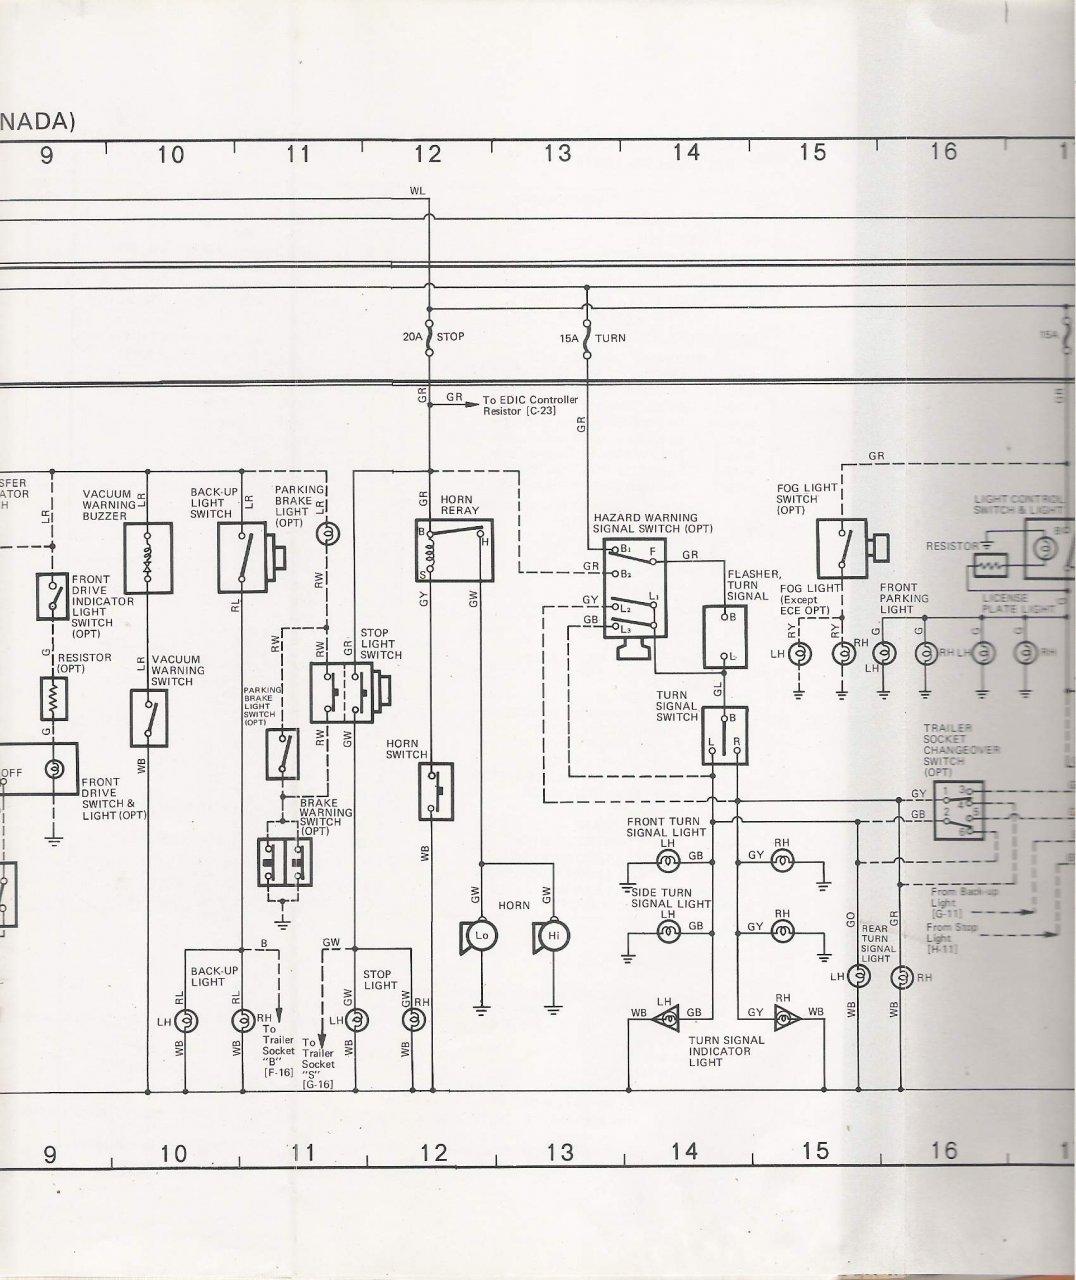 Beste 1984 Trans Am Schaltplan Fotos - Schaltplan Serie Circuit ...